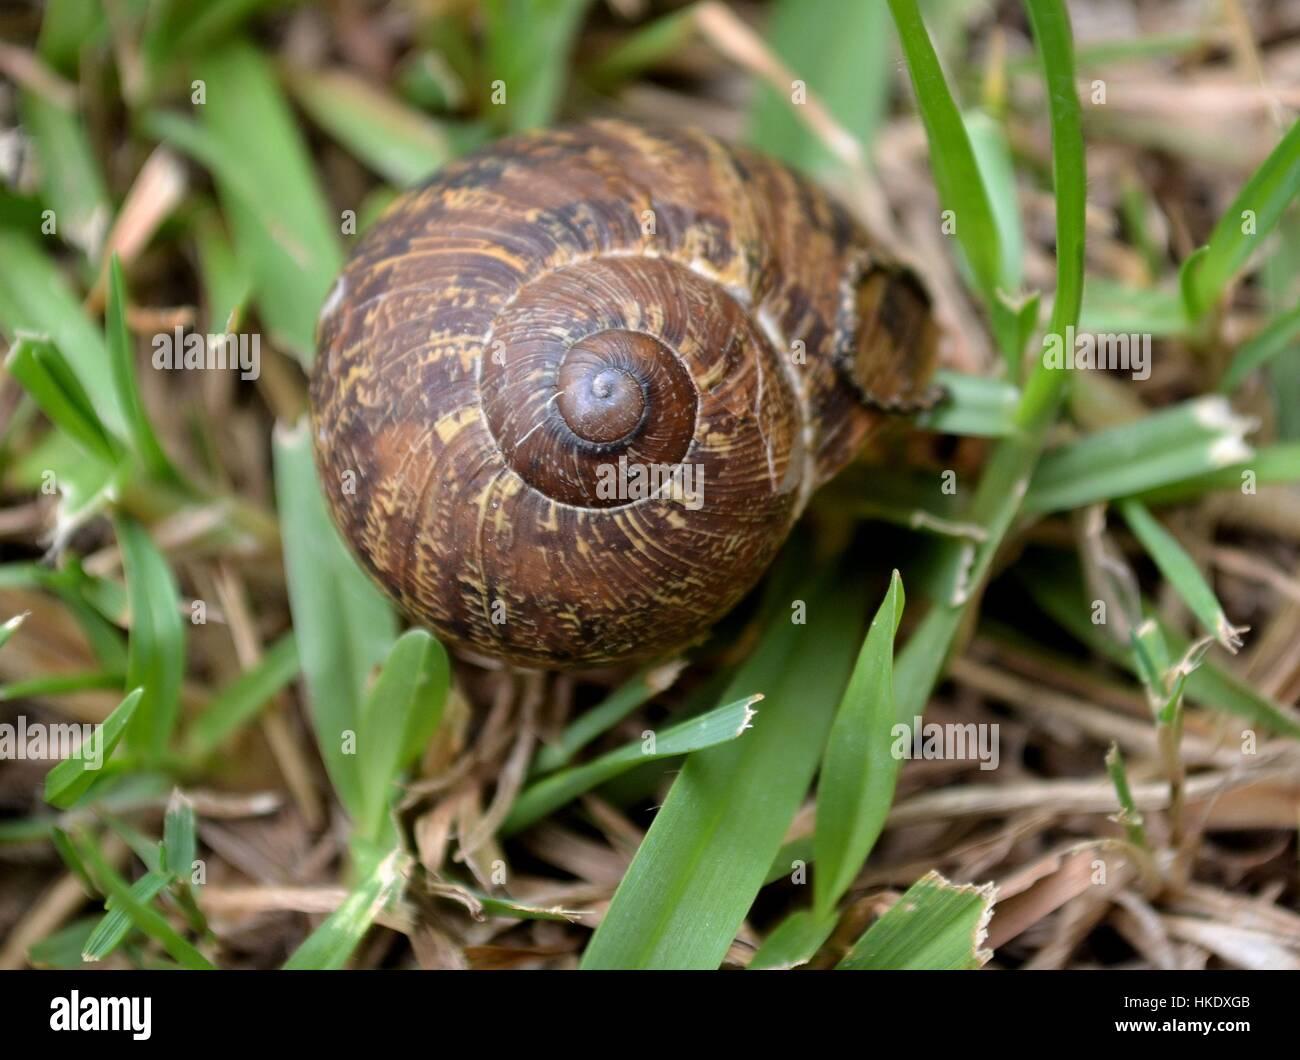 Garden snail in the grass - Stock Image